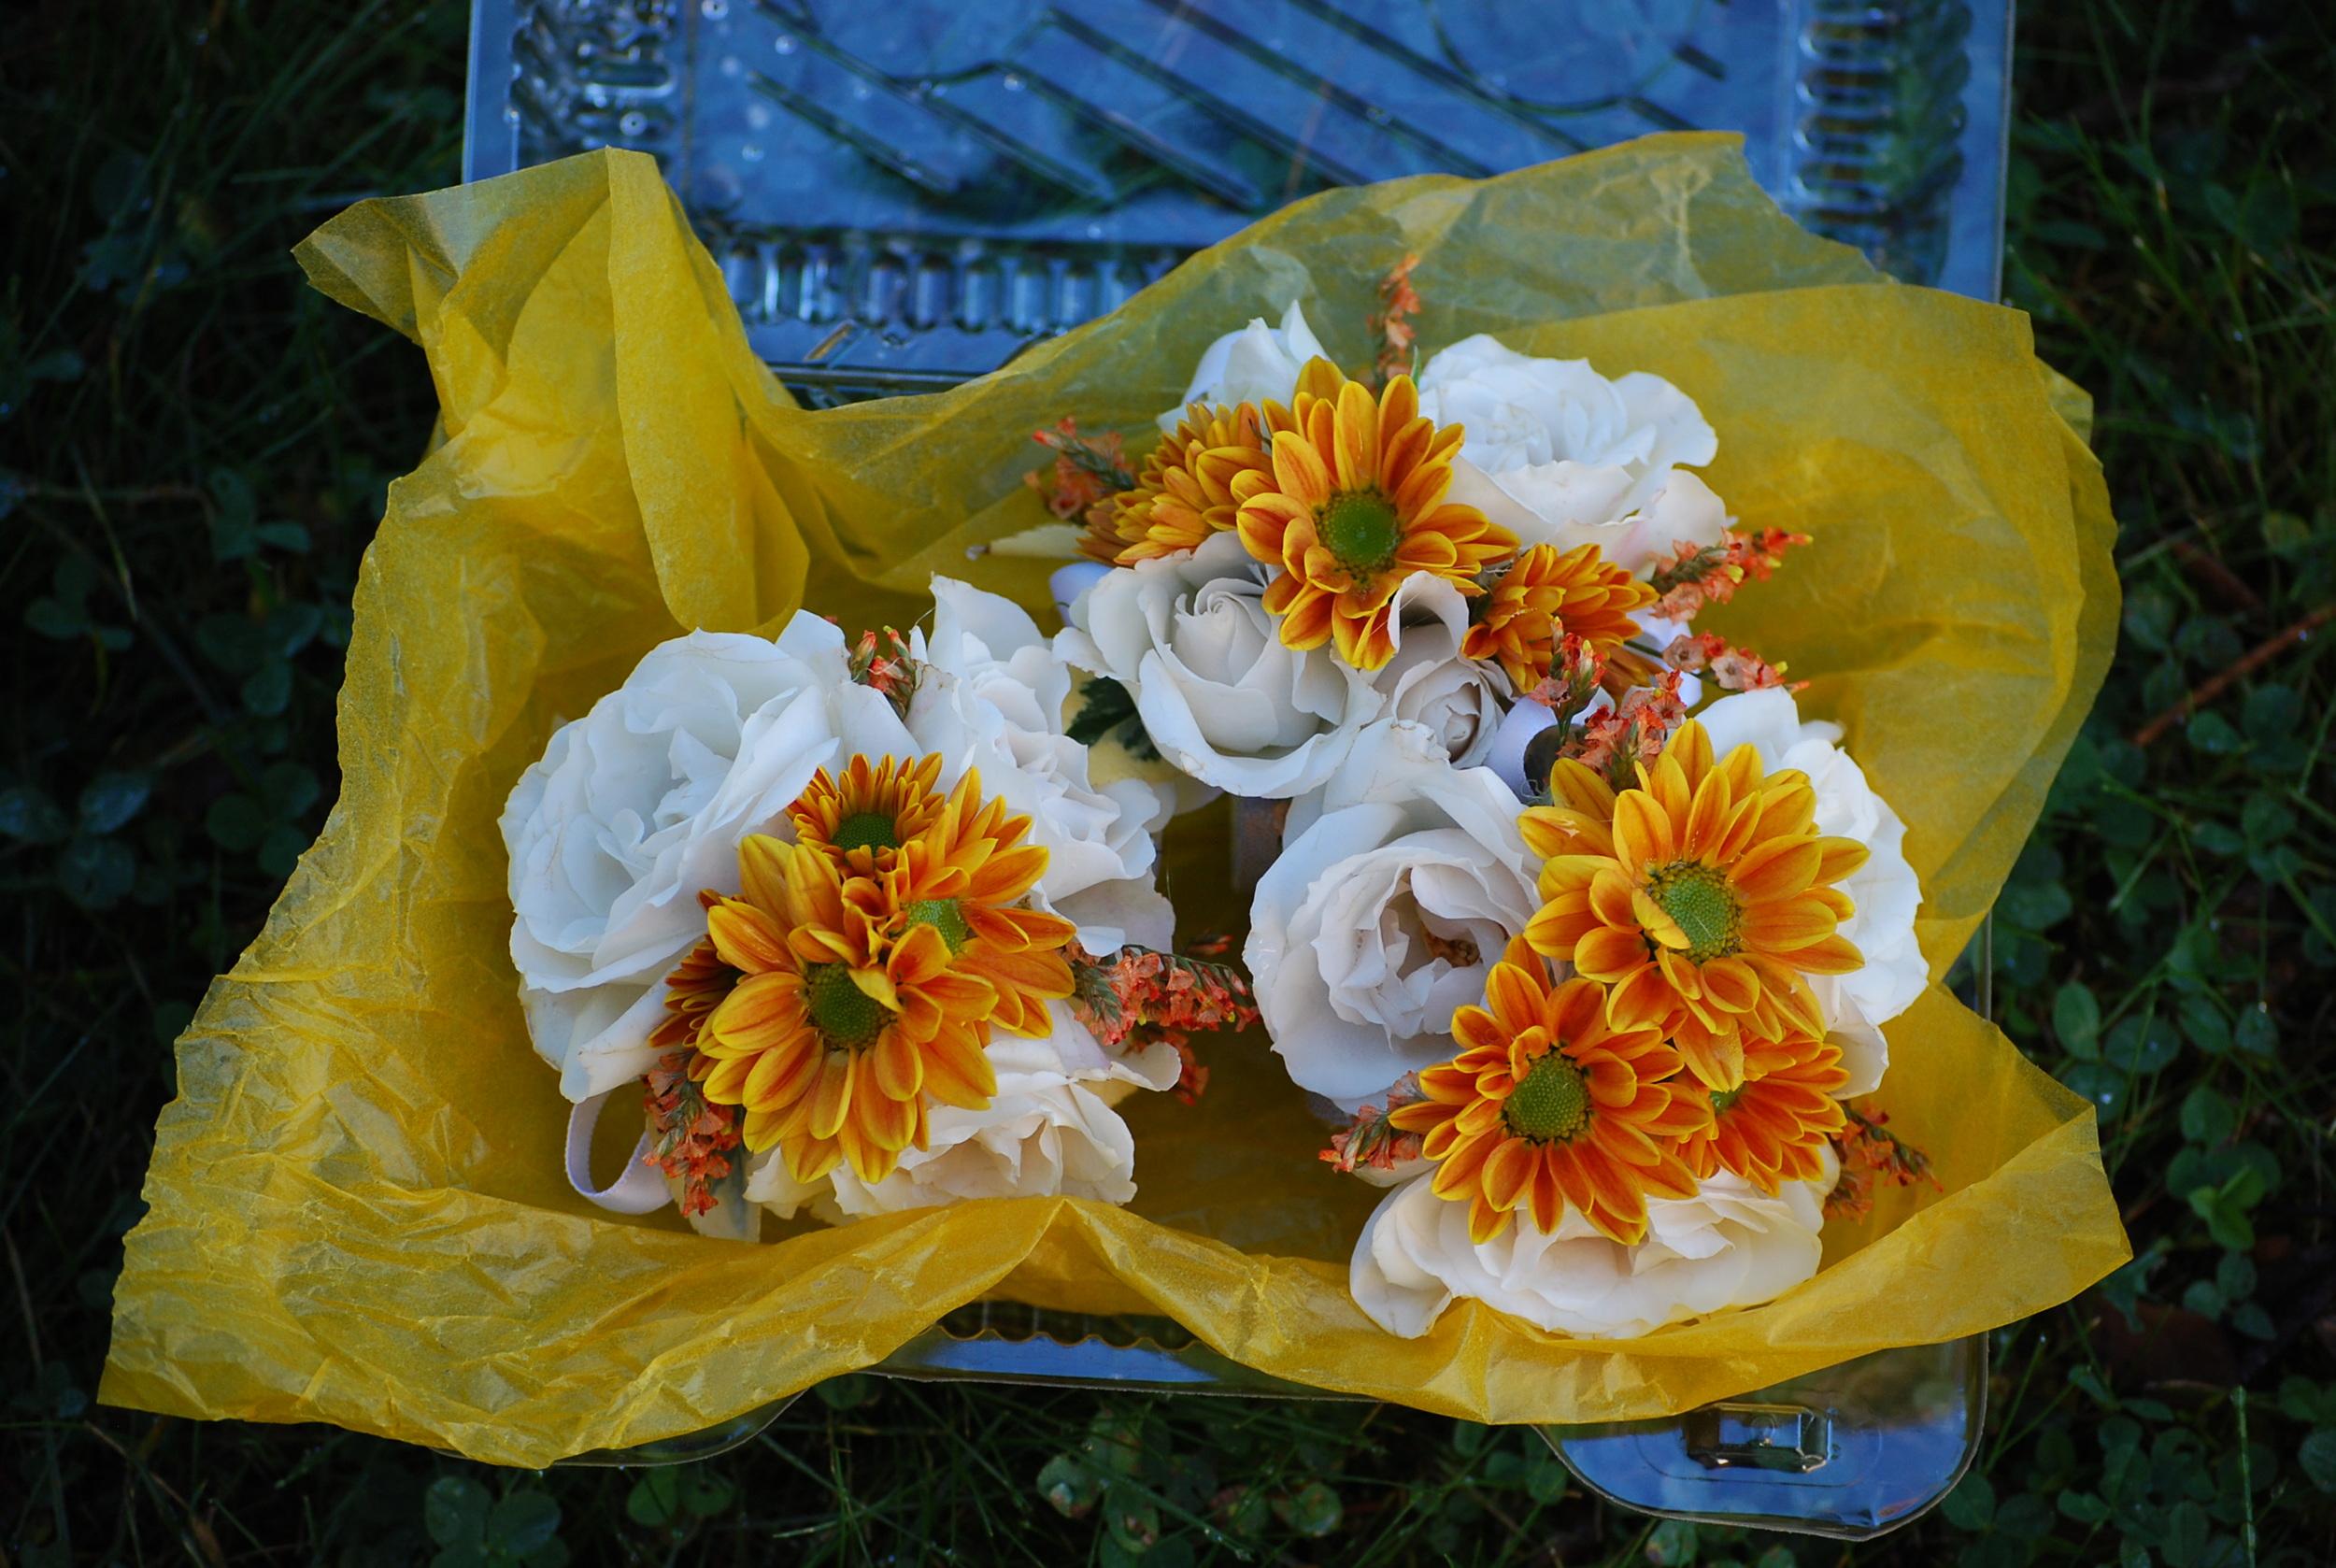 floral design by lili 018.JPG